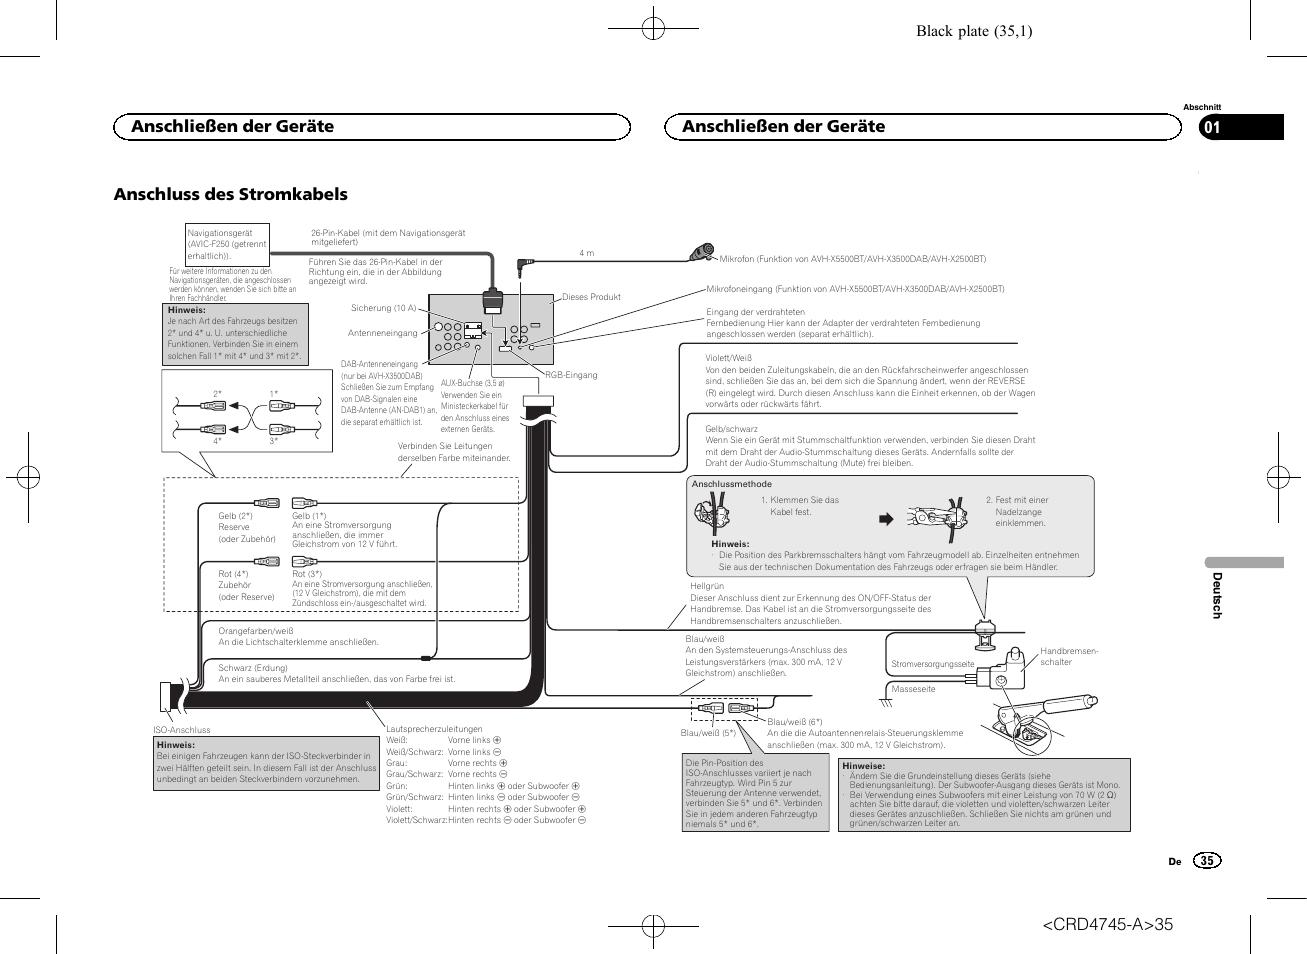 Anschluss Des Stromkabels Anschlie En Der Gerate Black